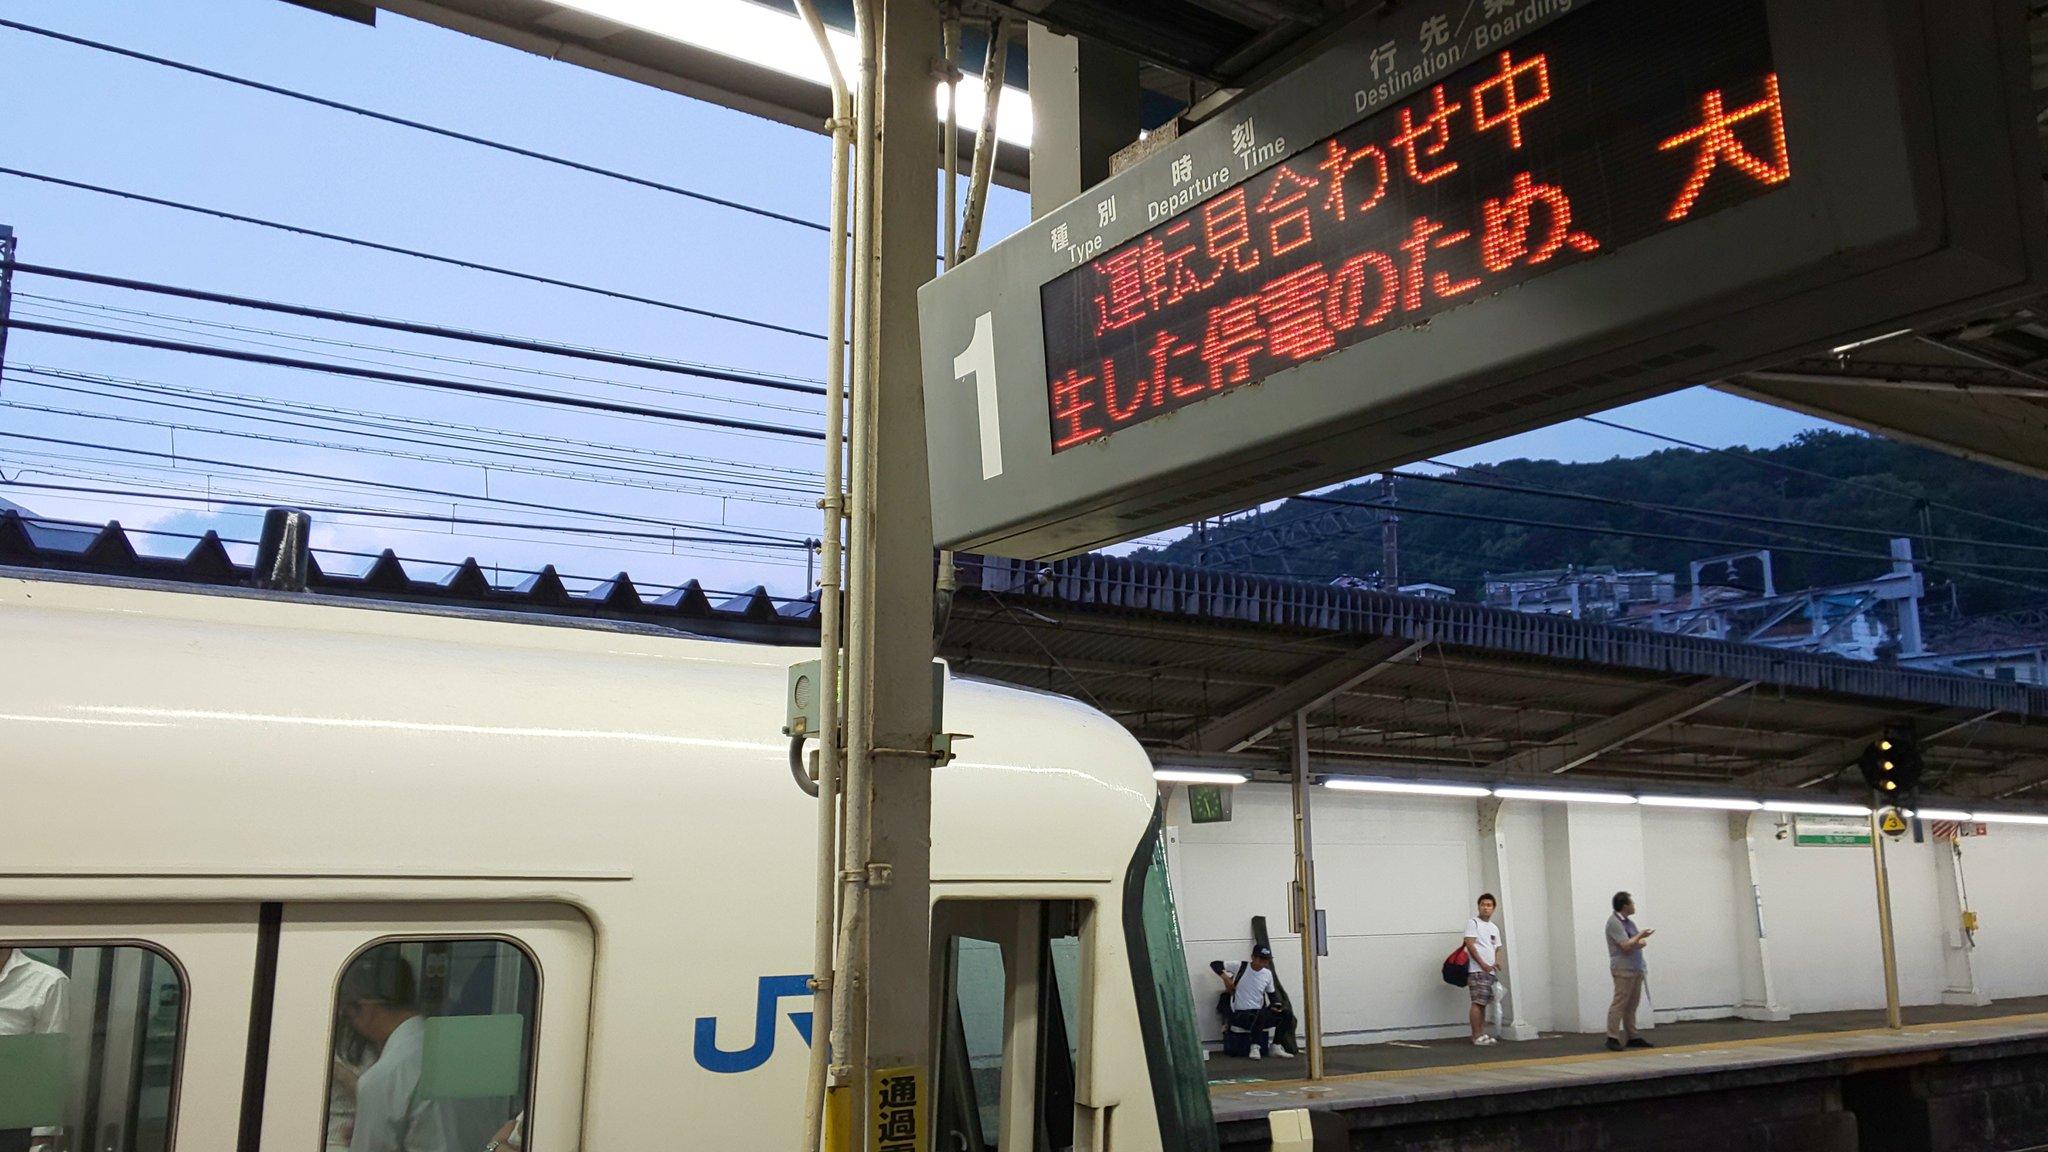 JR神戸線の塩屋駅で人身事故が起きた現場の画像